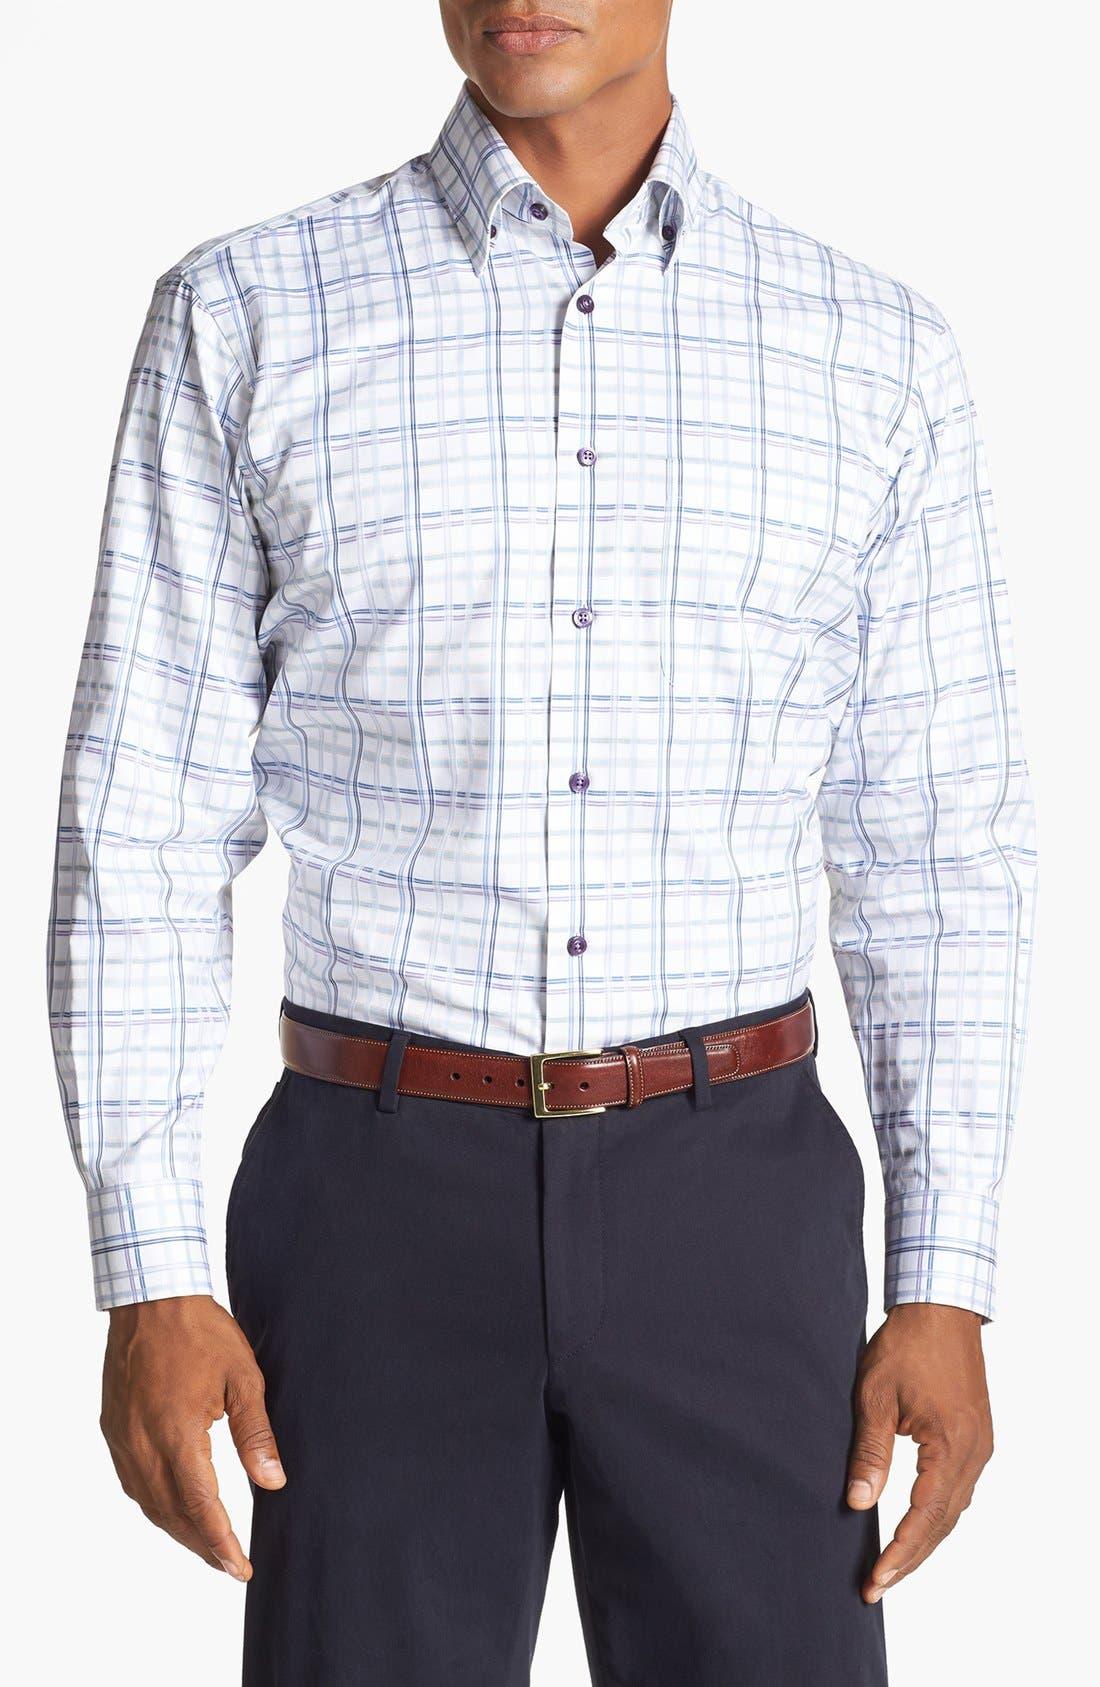 Alternate Image 1 Selected - Robert Talbott Windowpane Plaid Woven Sport Shirt